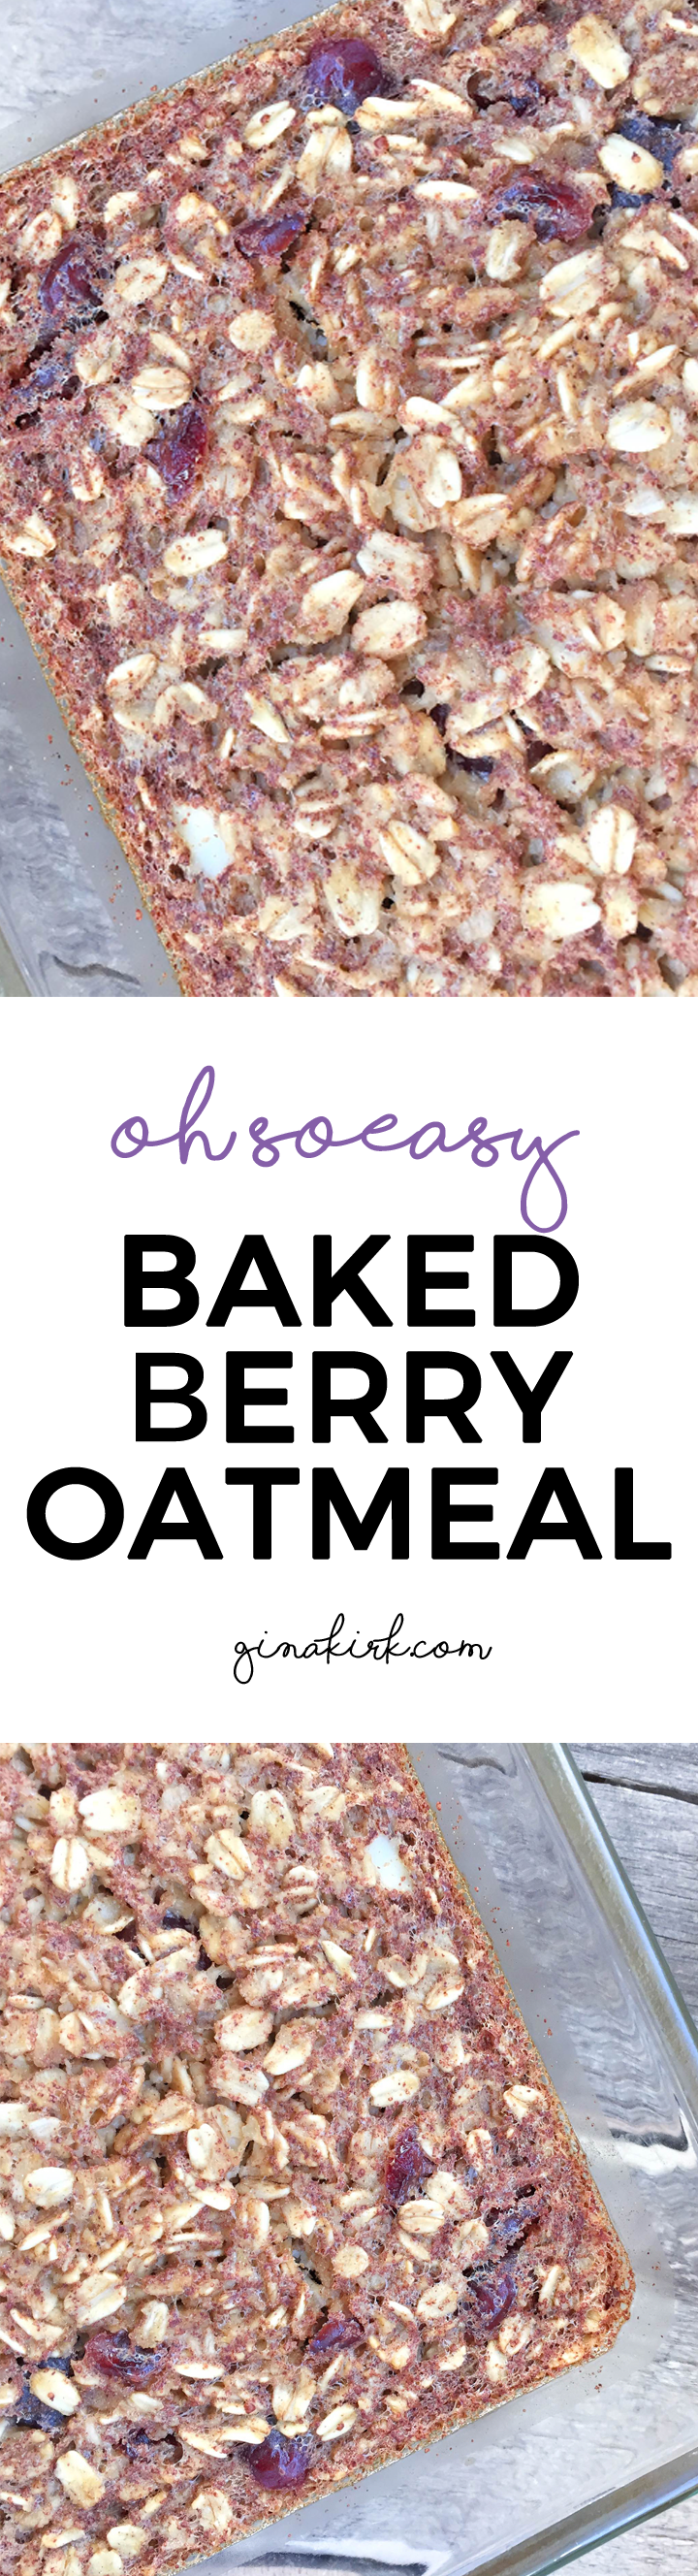 Baked berry oatmeal @ginaekirk GinaKirk.com